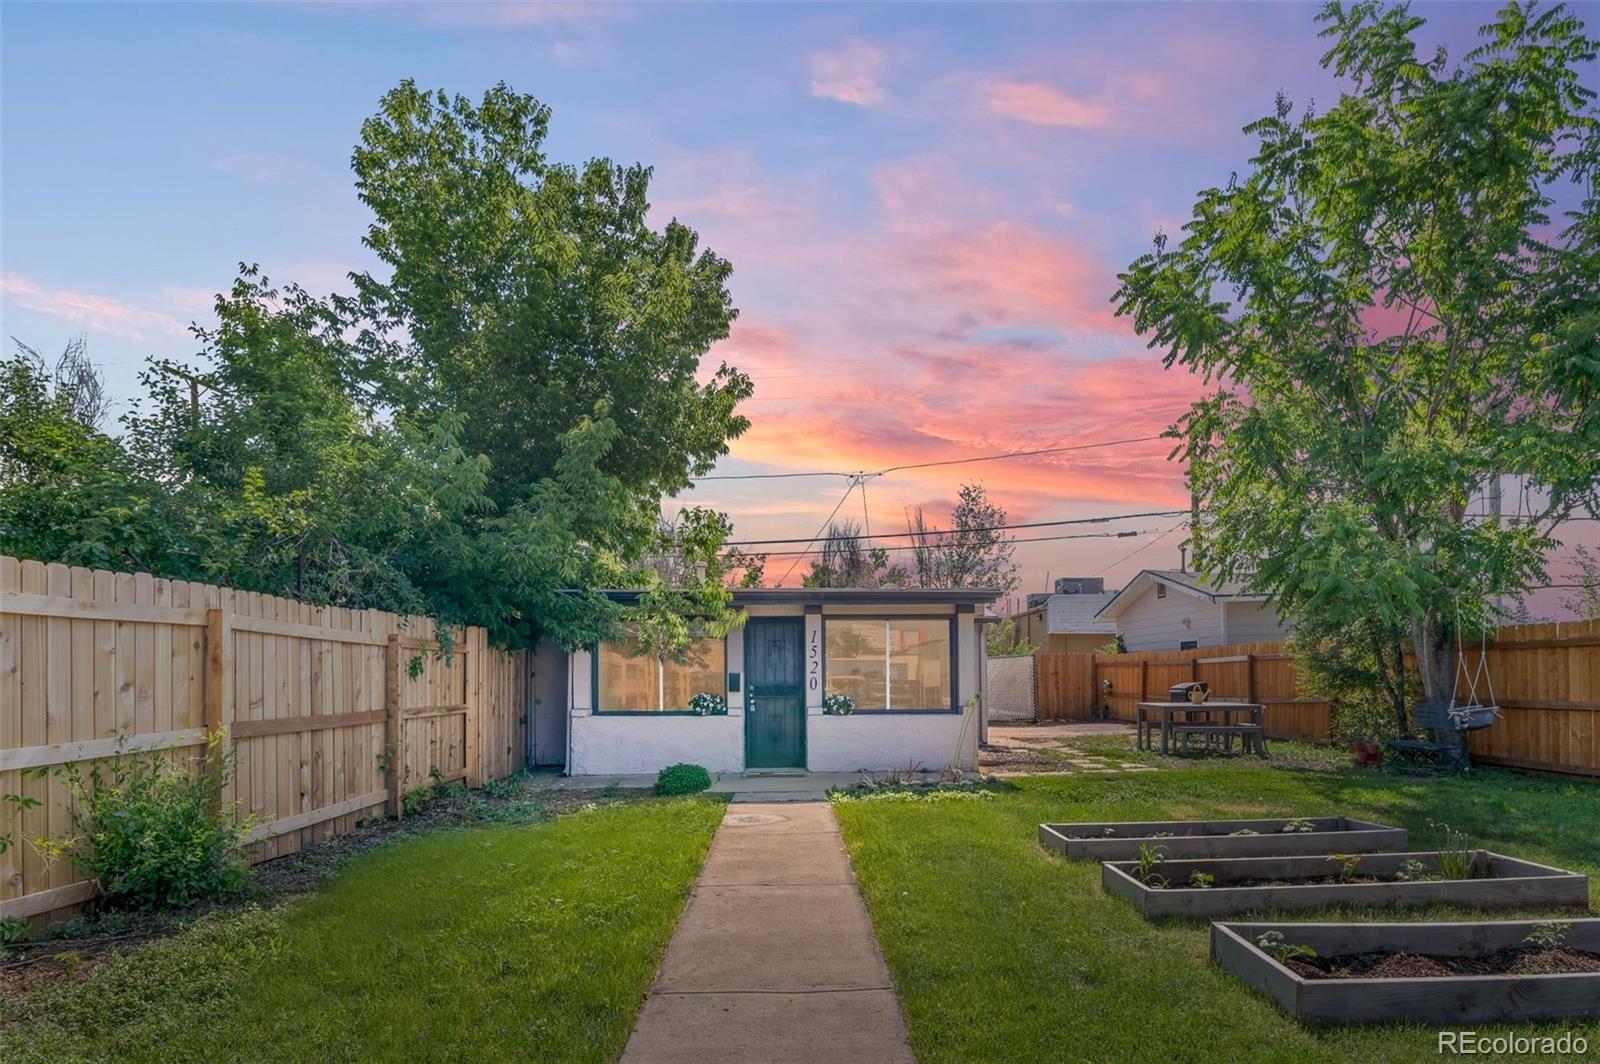 Photo of 1520 Tamarac Street, Denver, CO 80220 (MLS # 7942097)